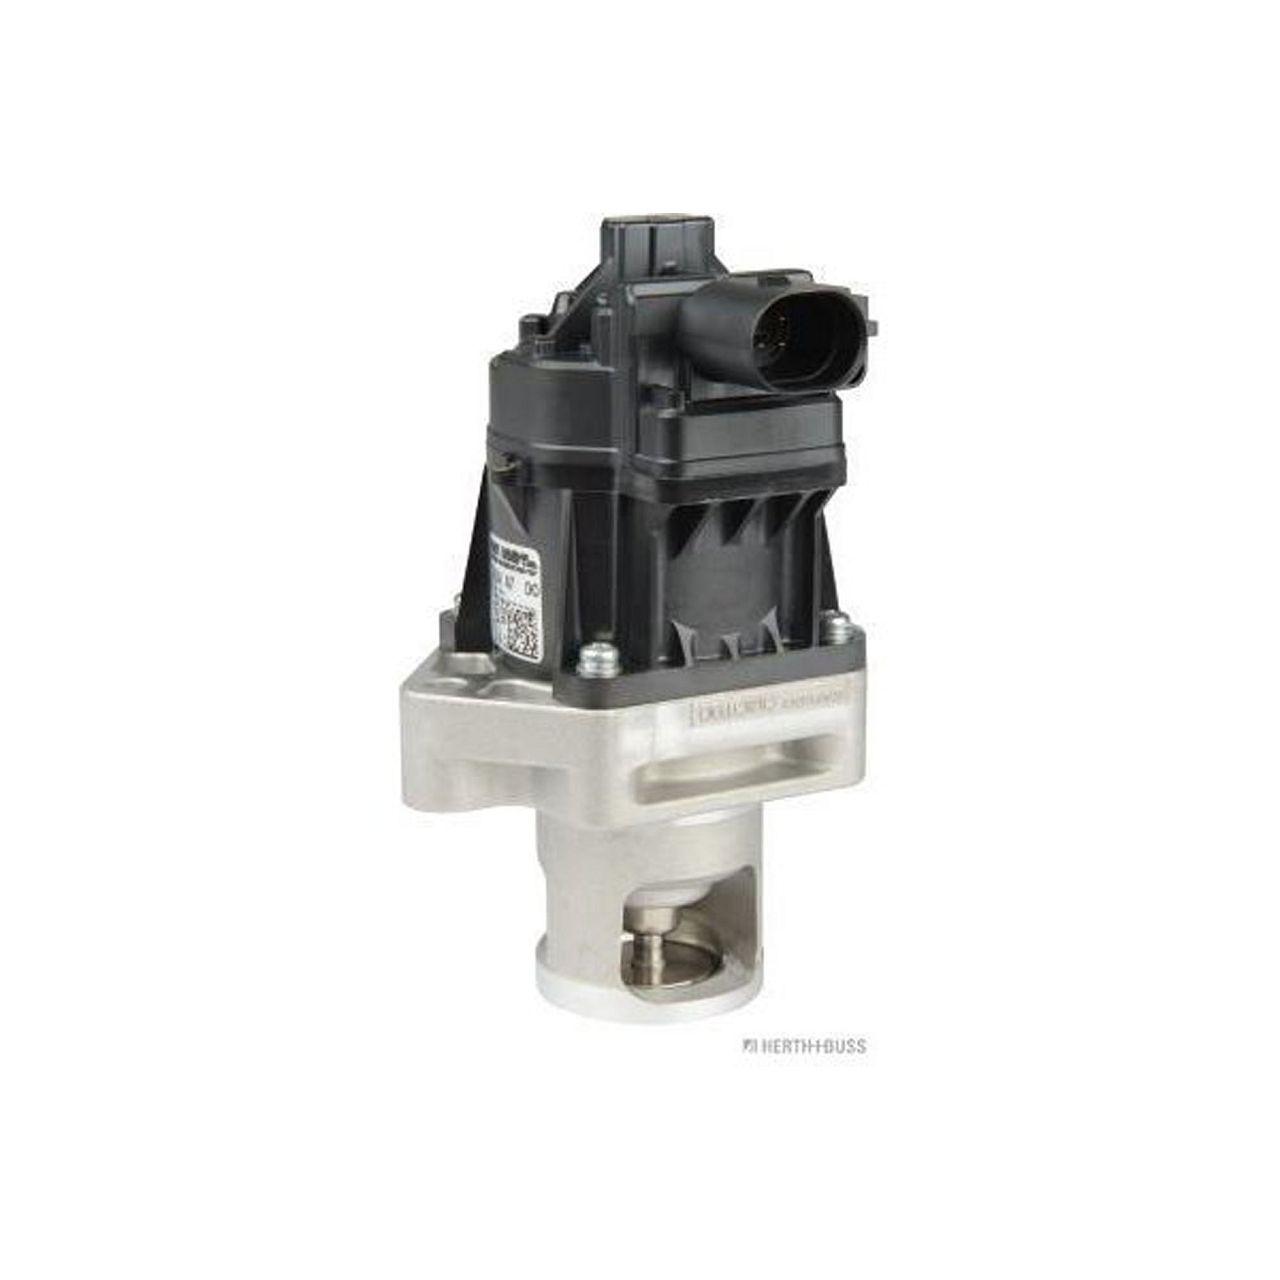 HERTH+BUSS ELPARTS AGR Ventil für CHEVROLET MALIBU (V300) OPEL ASTRA J SAAB 9-5